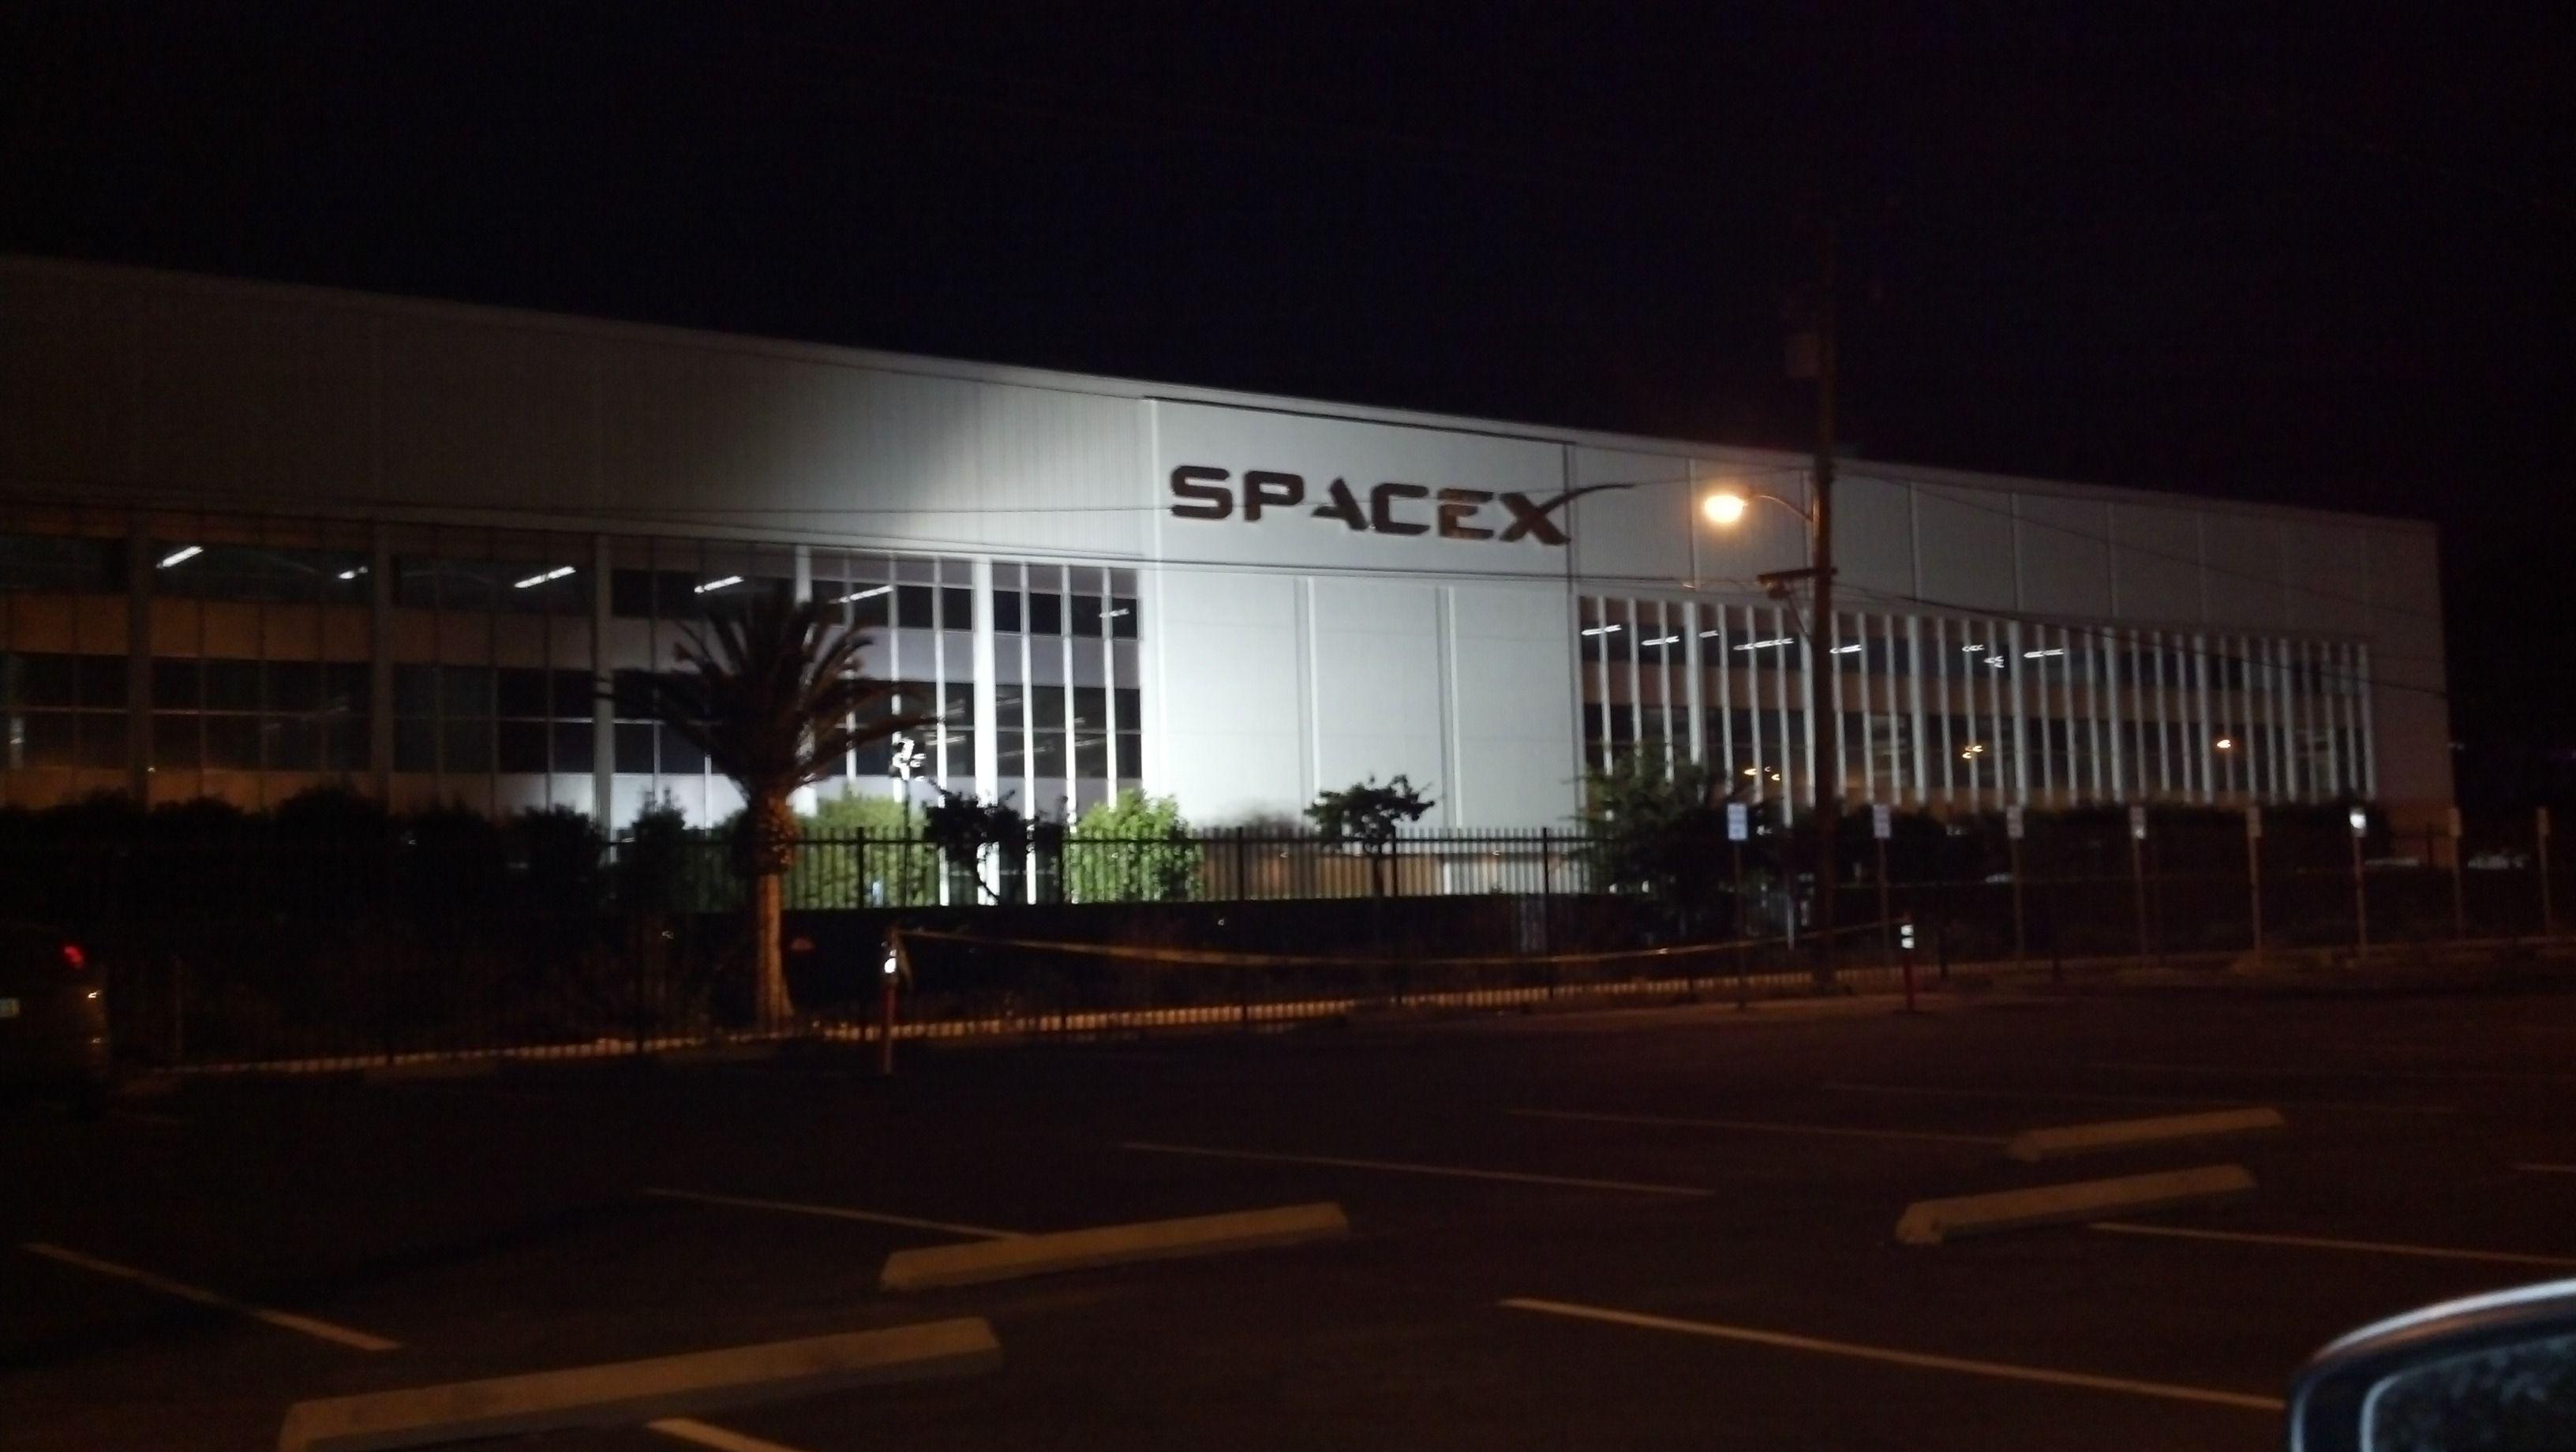 spacex hawthorne facility - HD3264×1840